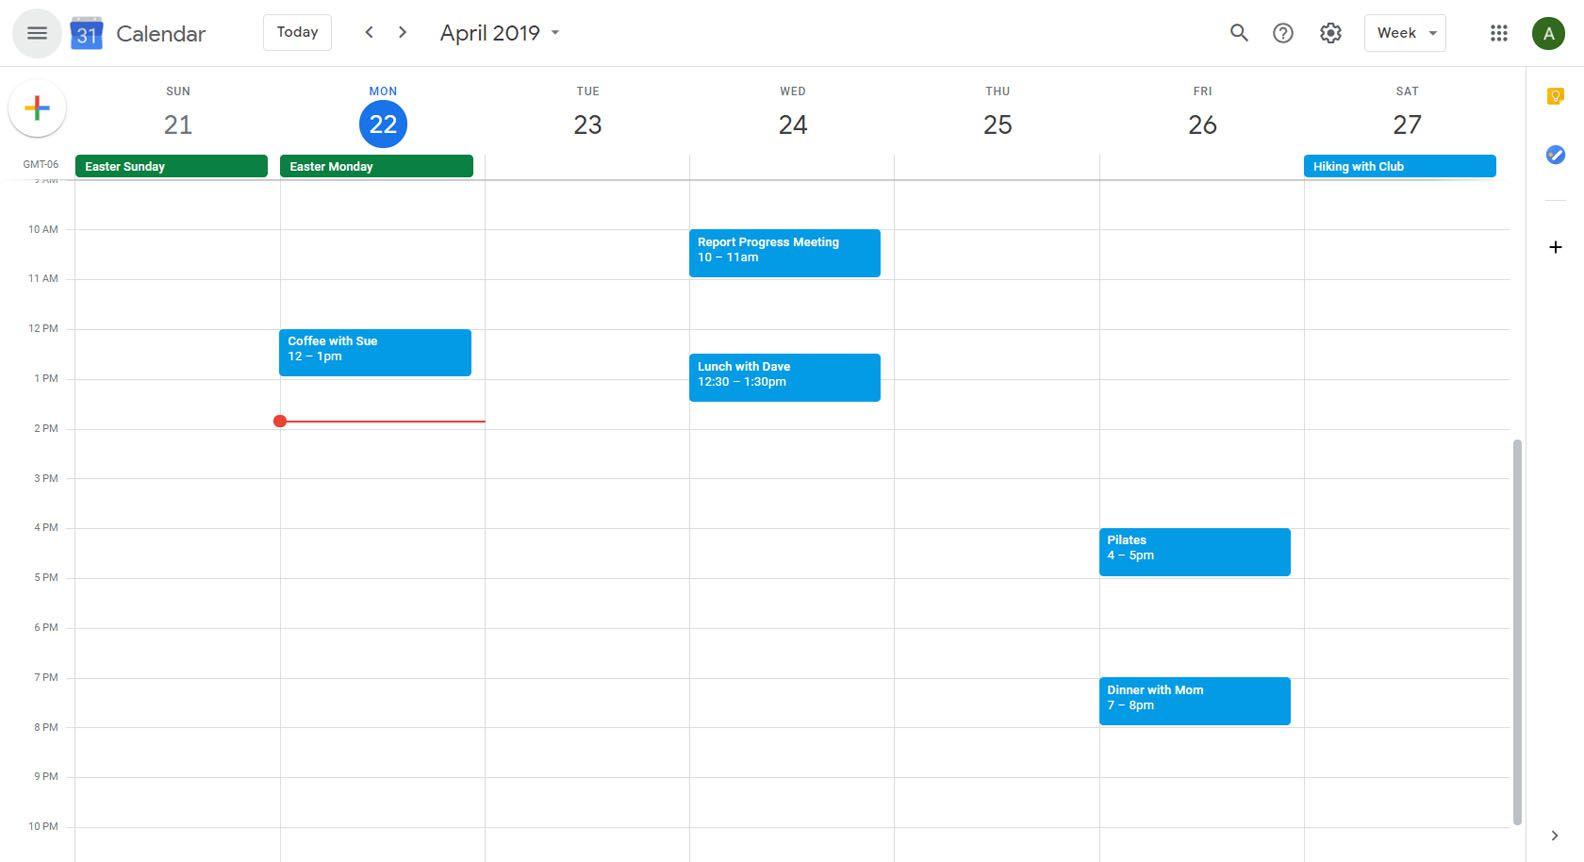 How to Automatically Add Birthdays to Google Calendar